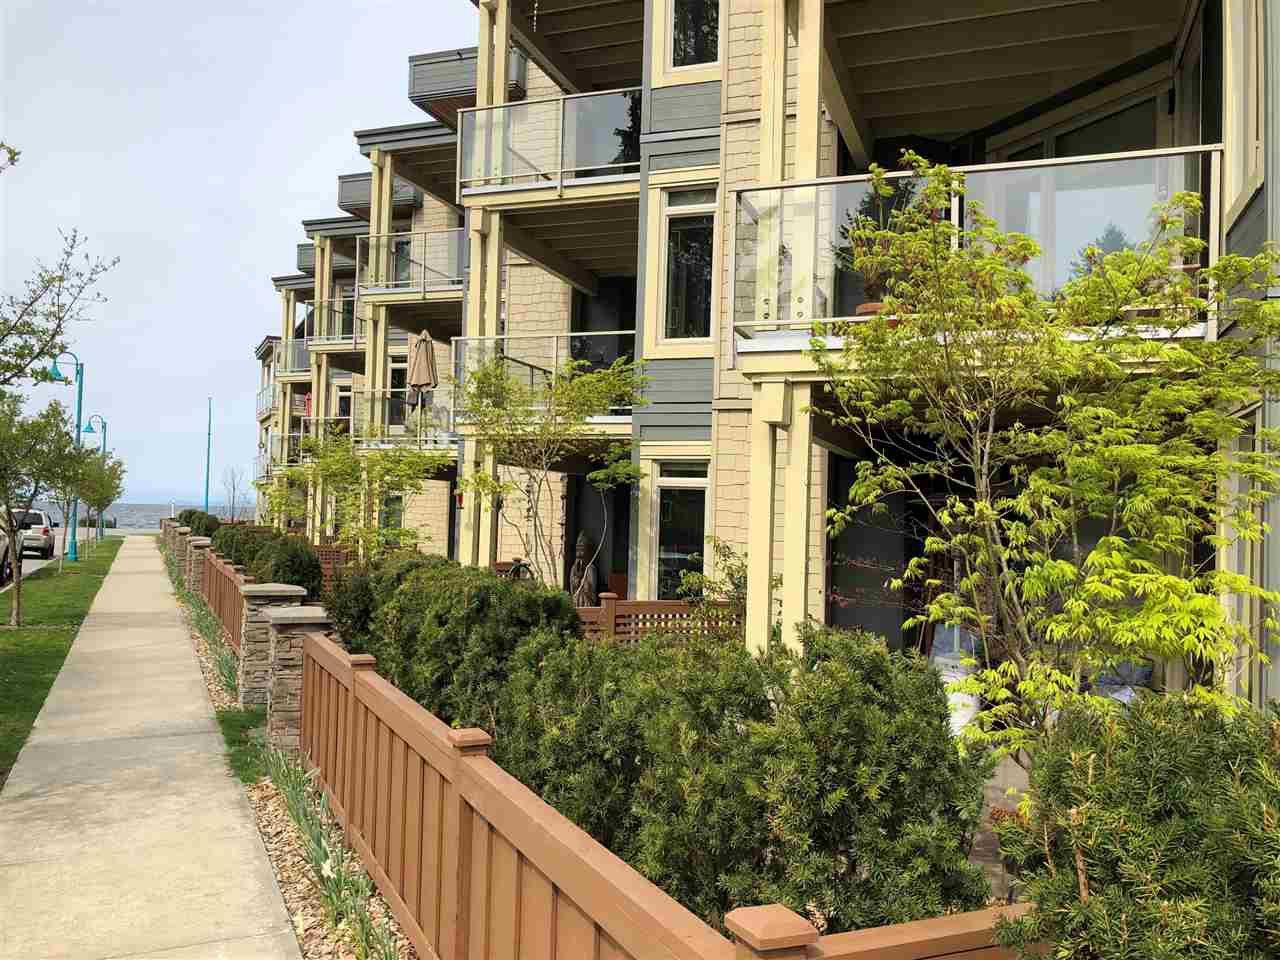 "Main Photo: 113 5160 DAVIS BAY Road in Sechelt: Sechelt District Condo for sale in ""THE WEST"" (Sunshine Coast)  : MLS®# R2421160"